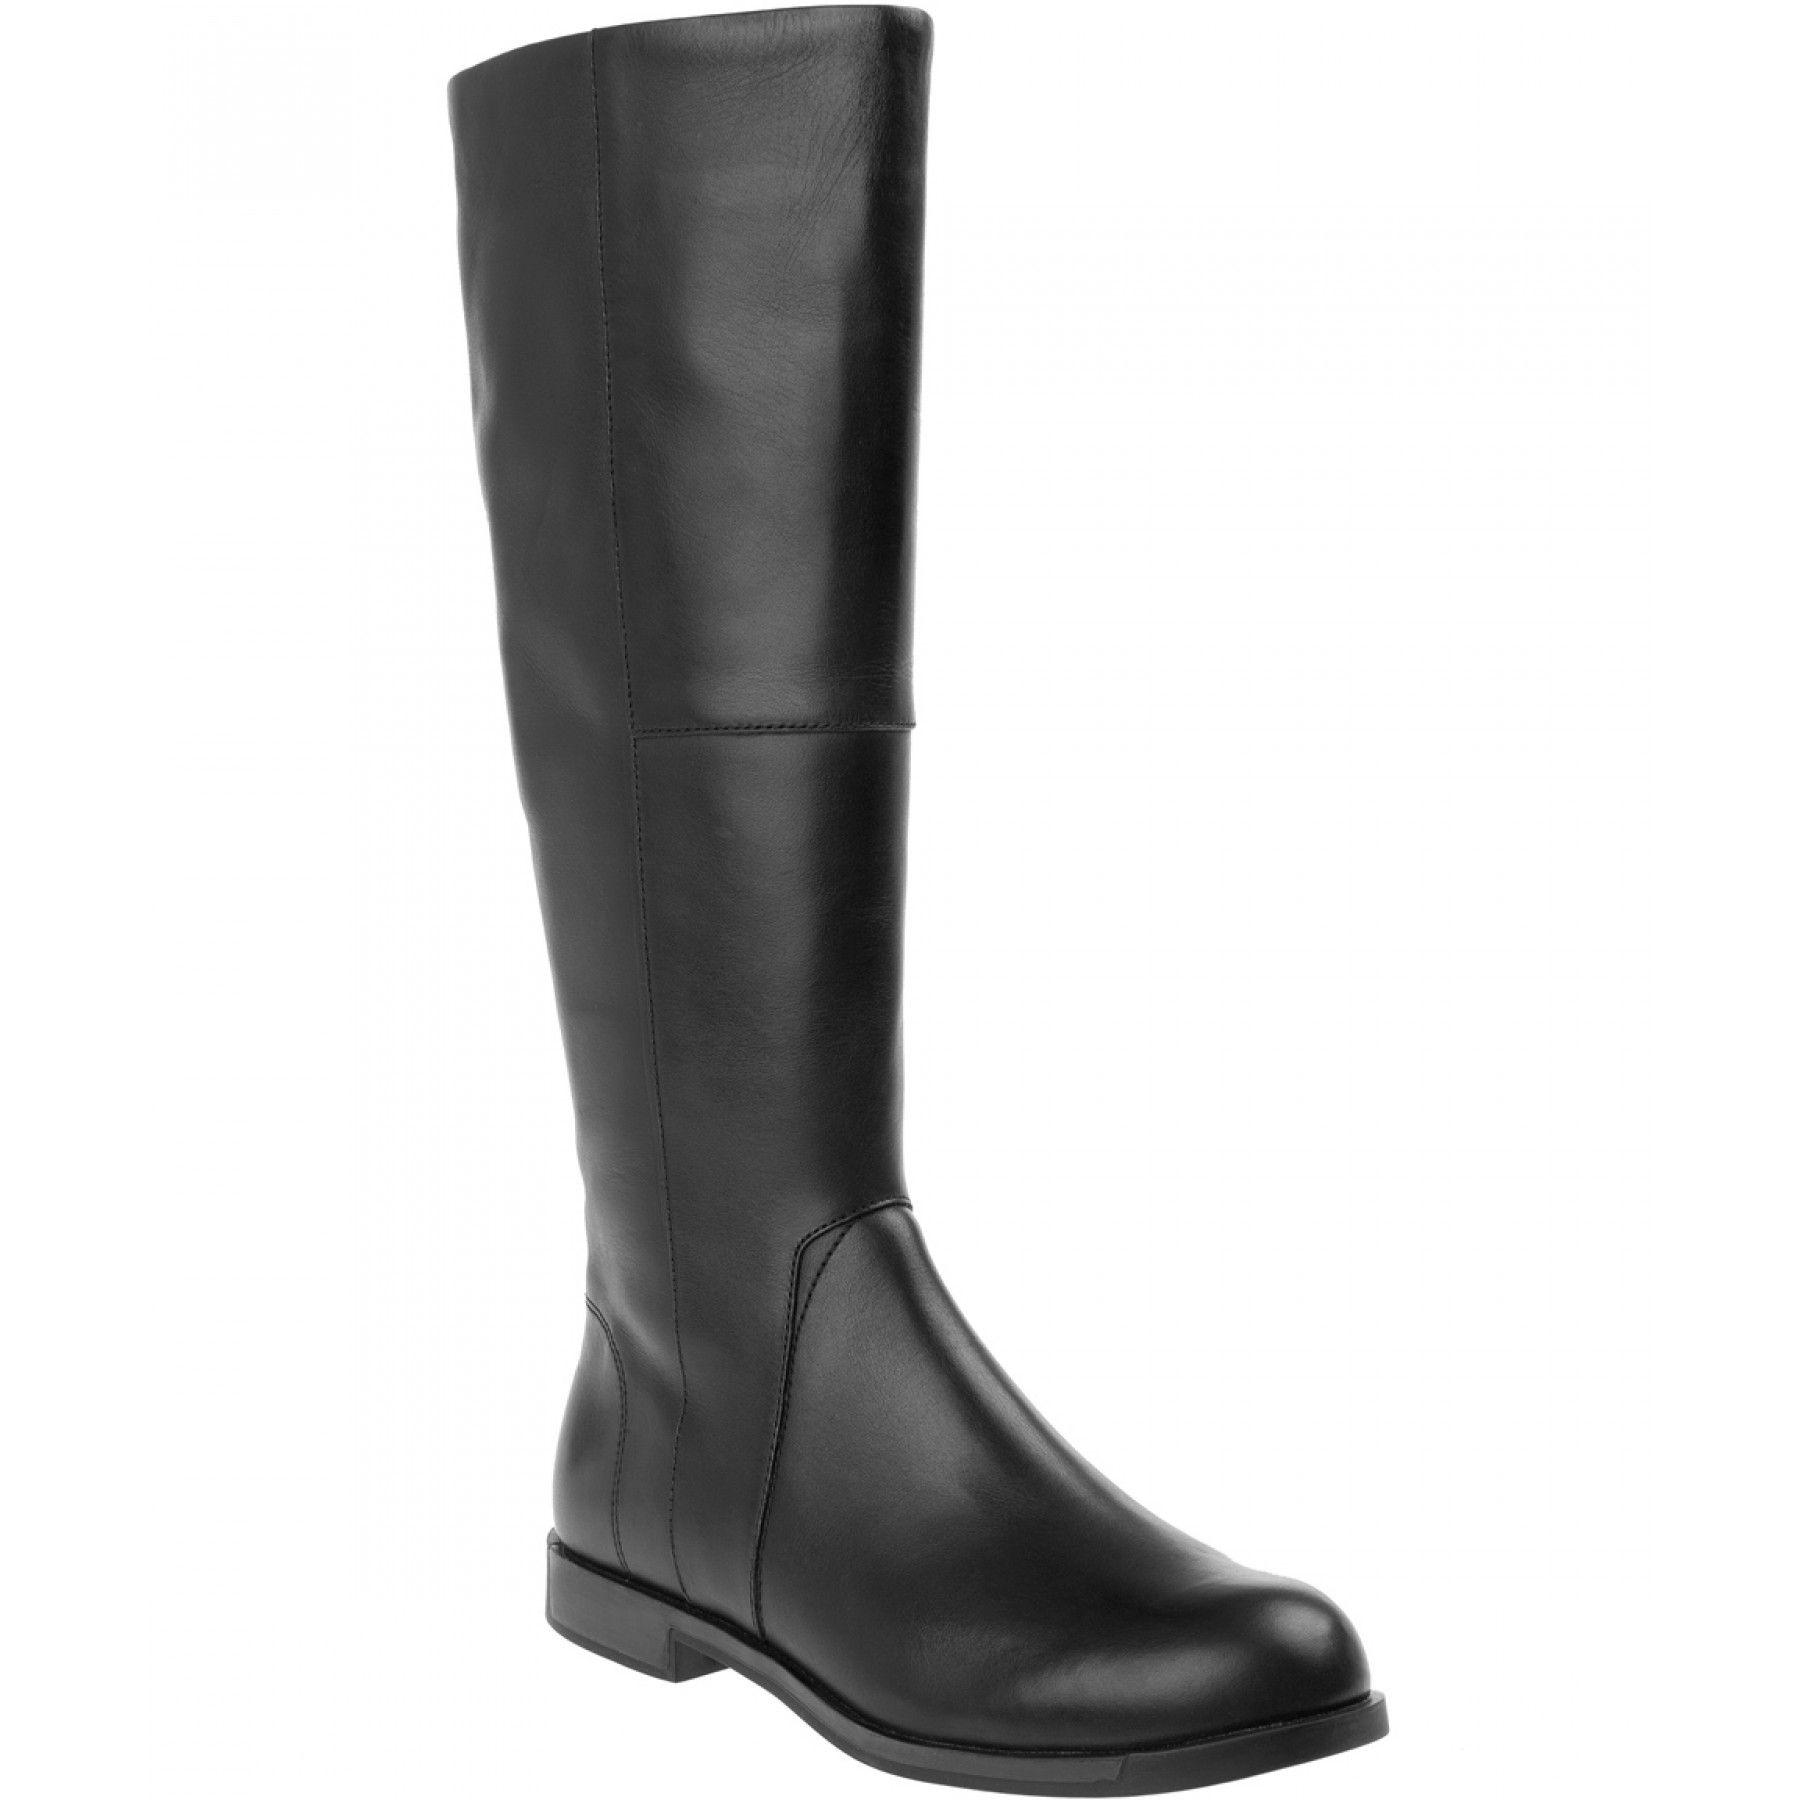 Bota de piel negra, caña alta y de  pisa  de Camper  K400156 001 7d0125